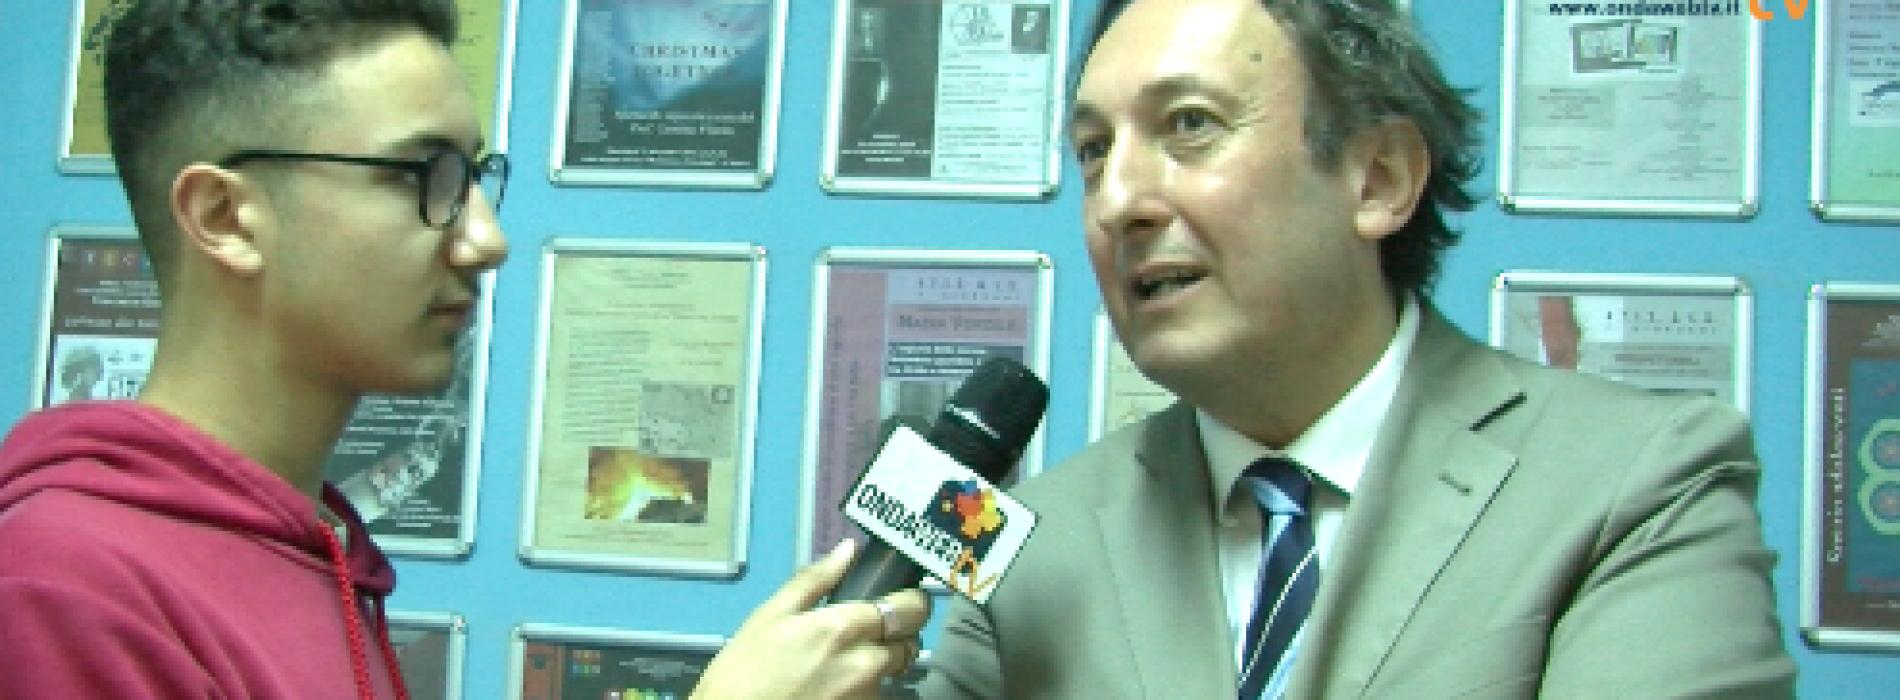 Tv Giordani incontra Bruno Saviani